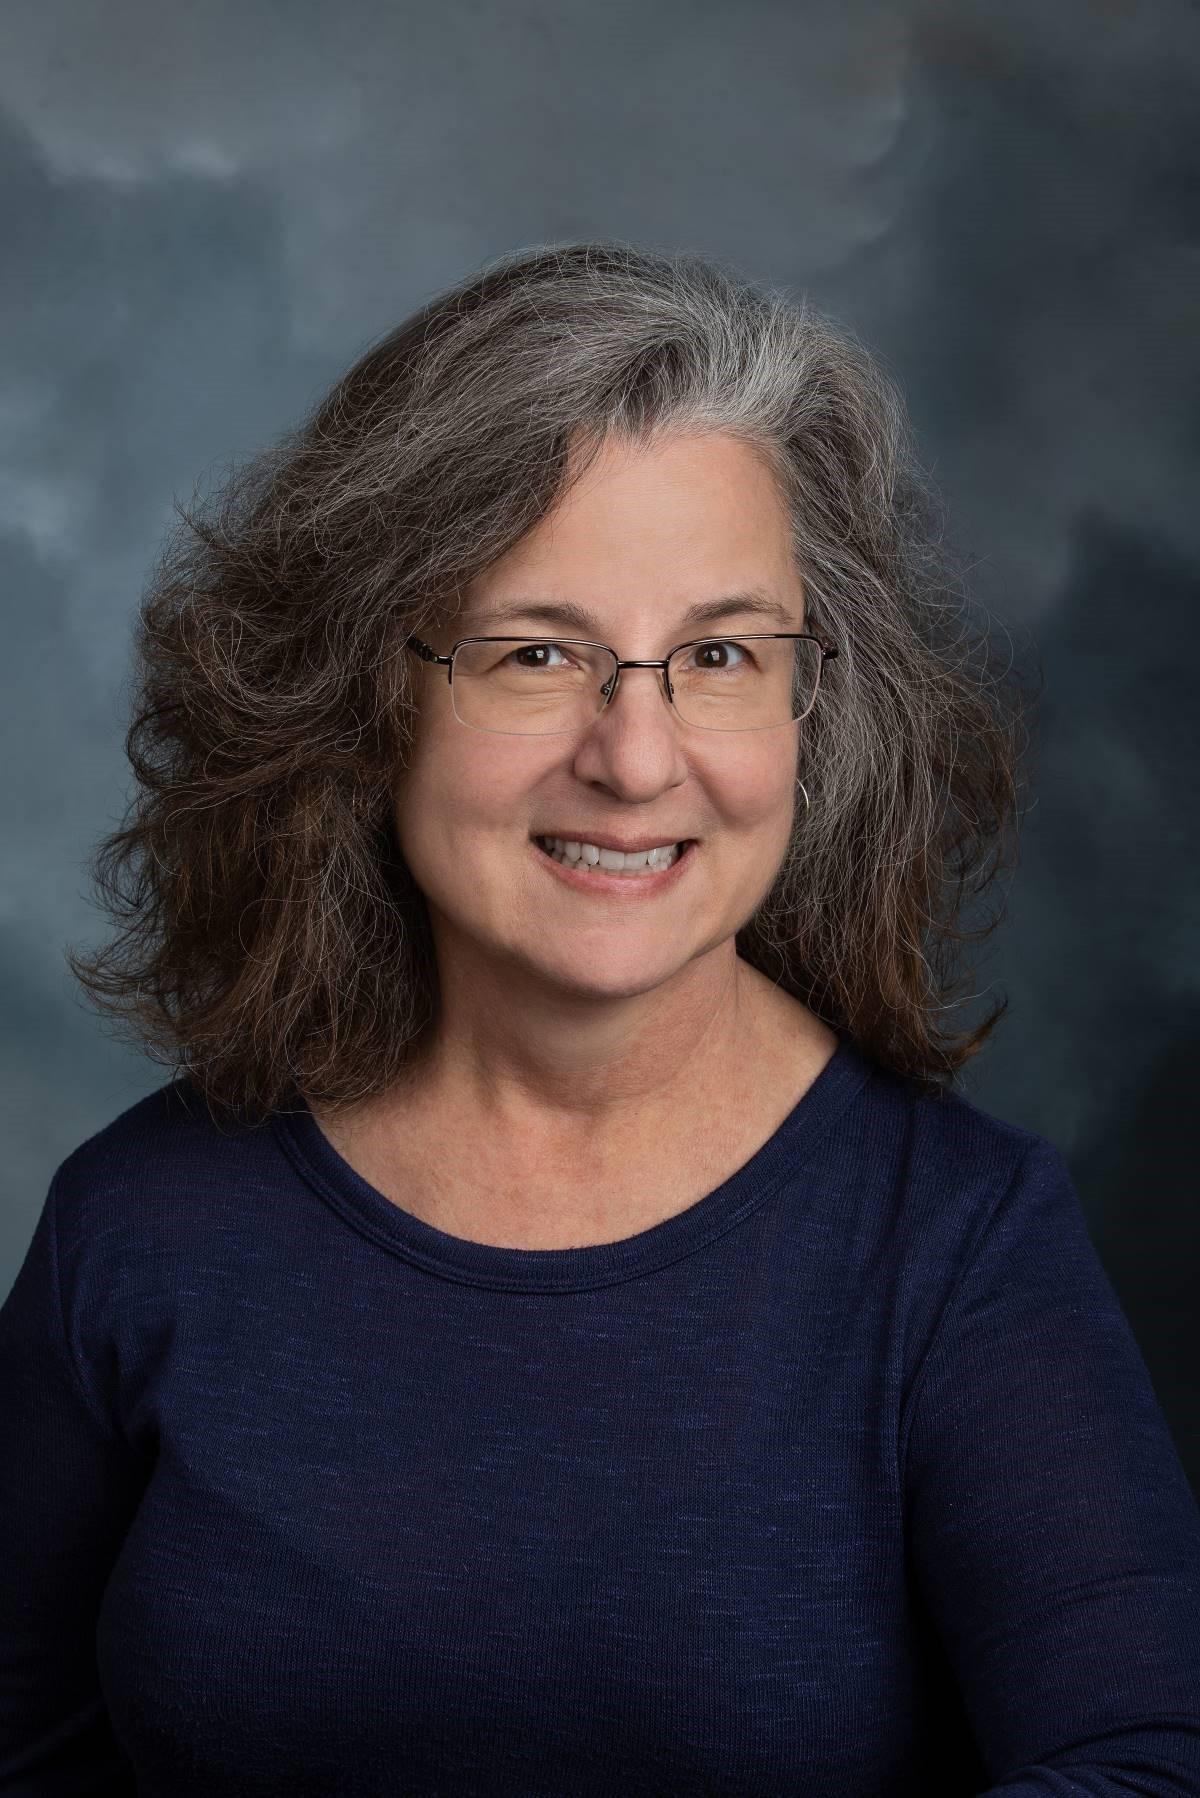 Karen L. Peck